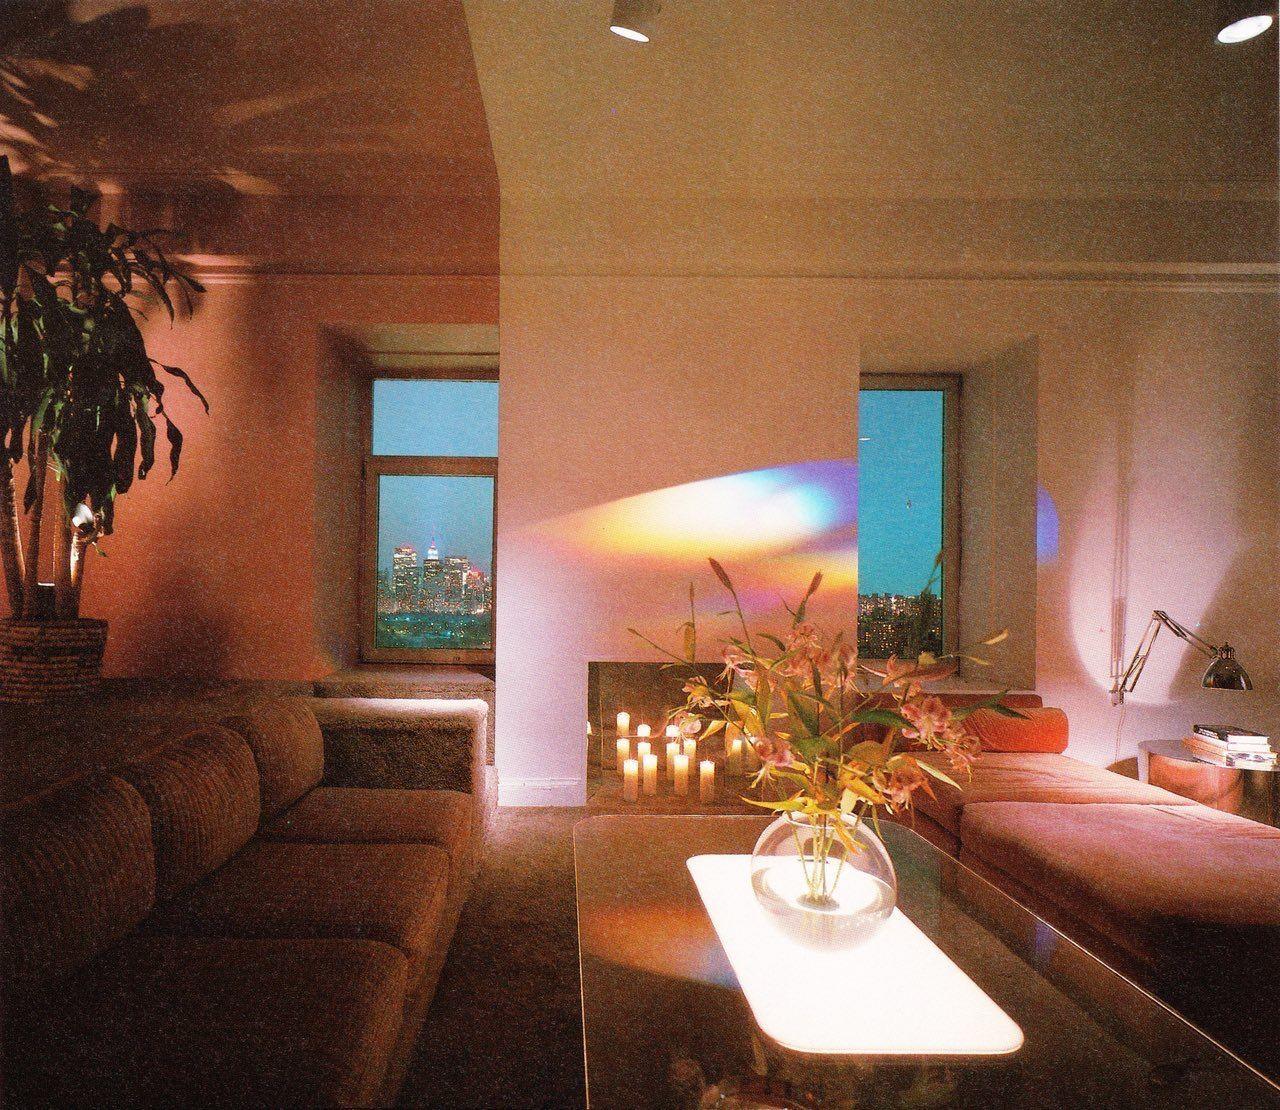 Interior Design Blogs Internship For Interior Design Art Deco Interior Design Interior De In 2020 Vintage Interior Design 80s Interior Design Retro Interior Design